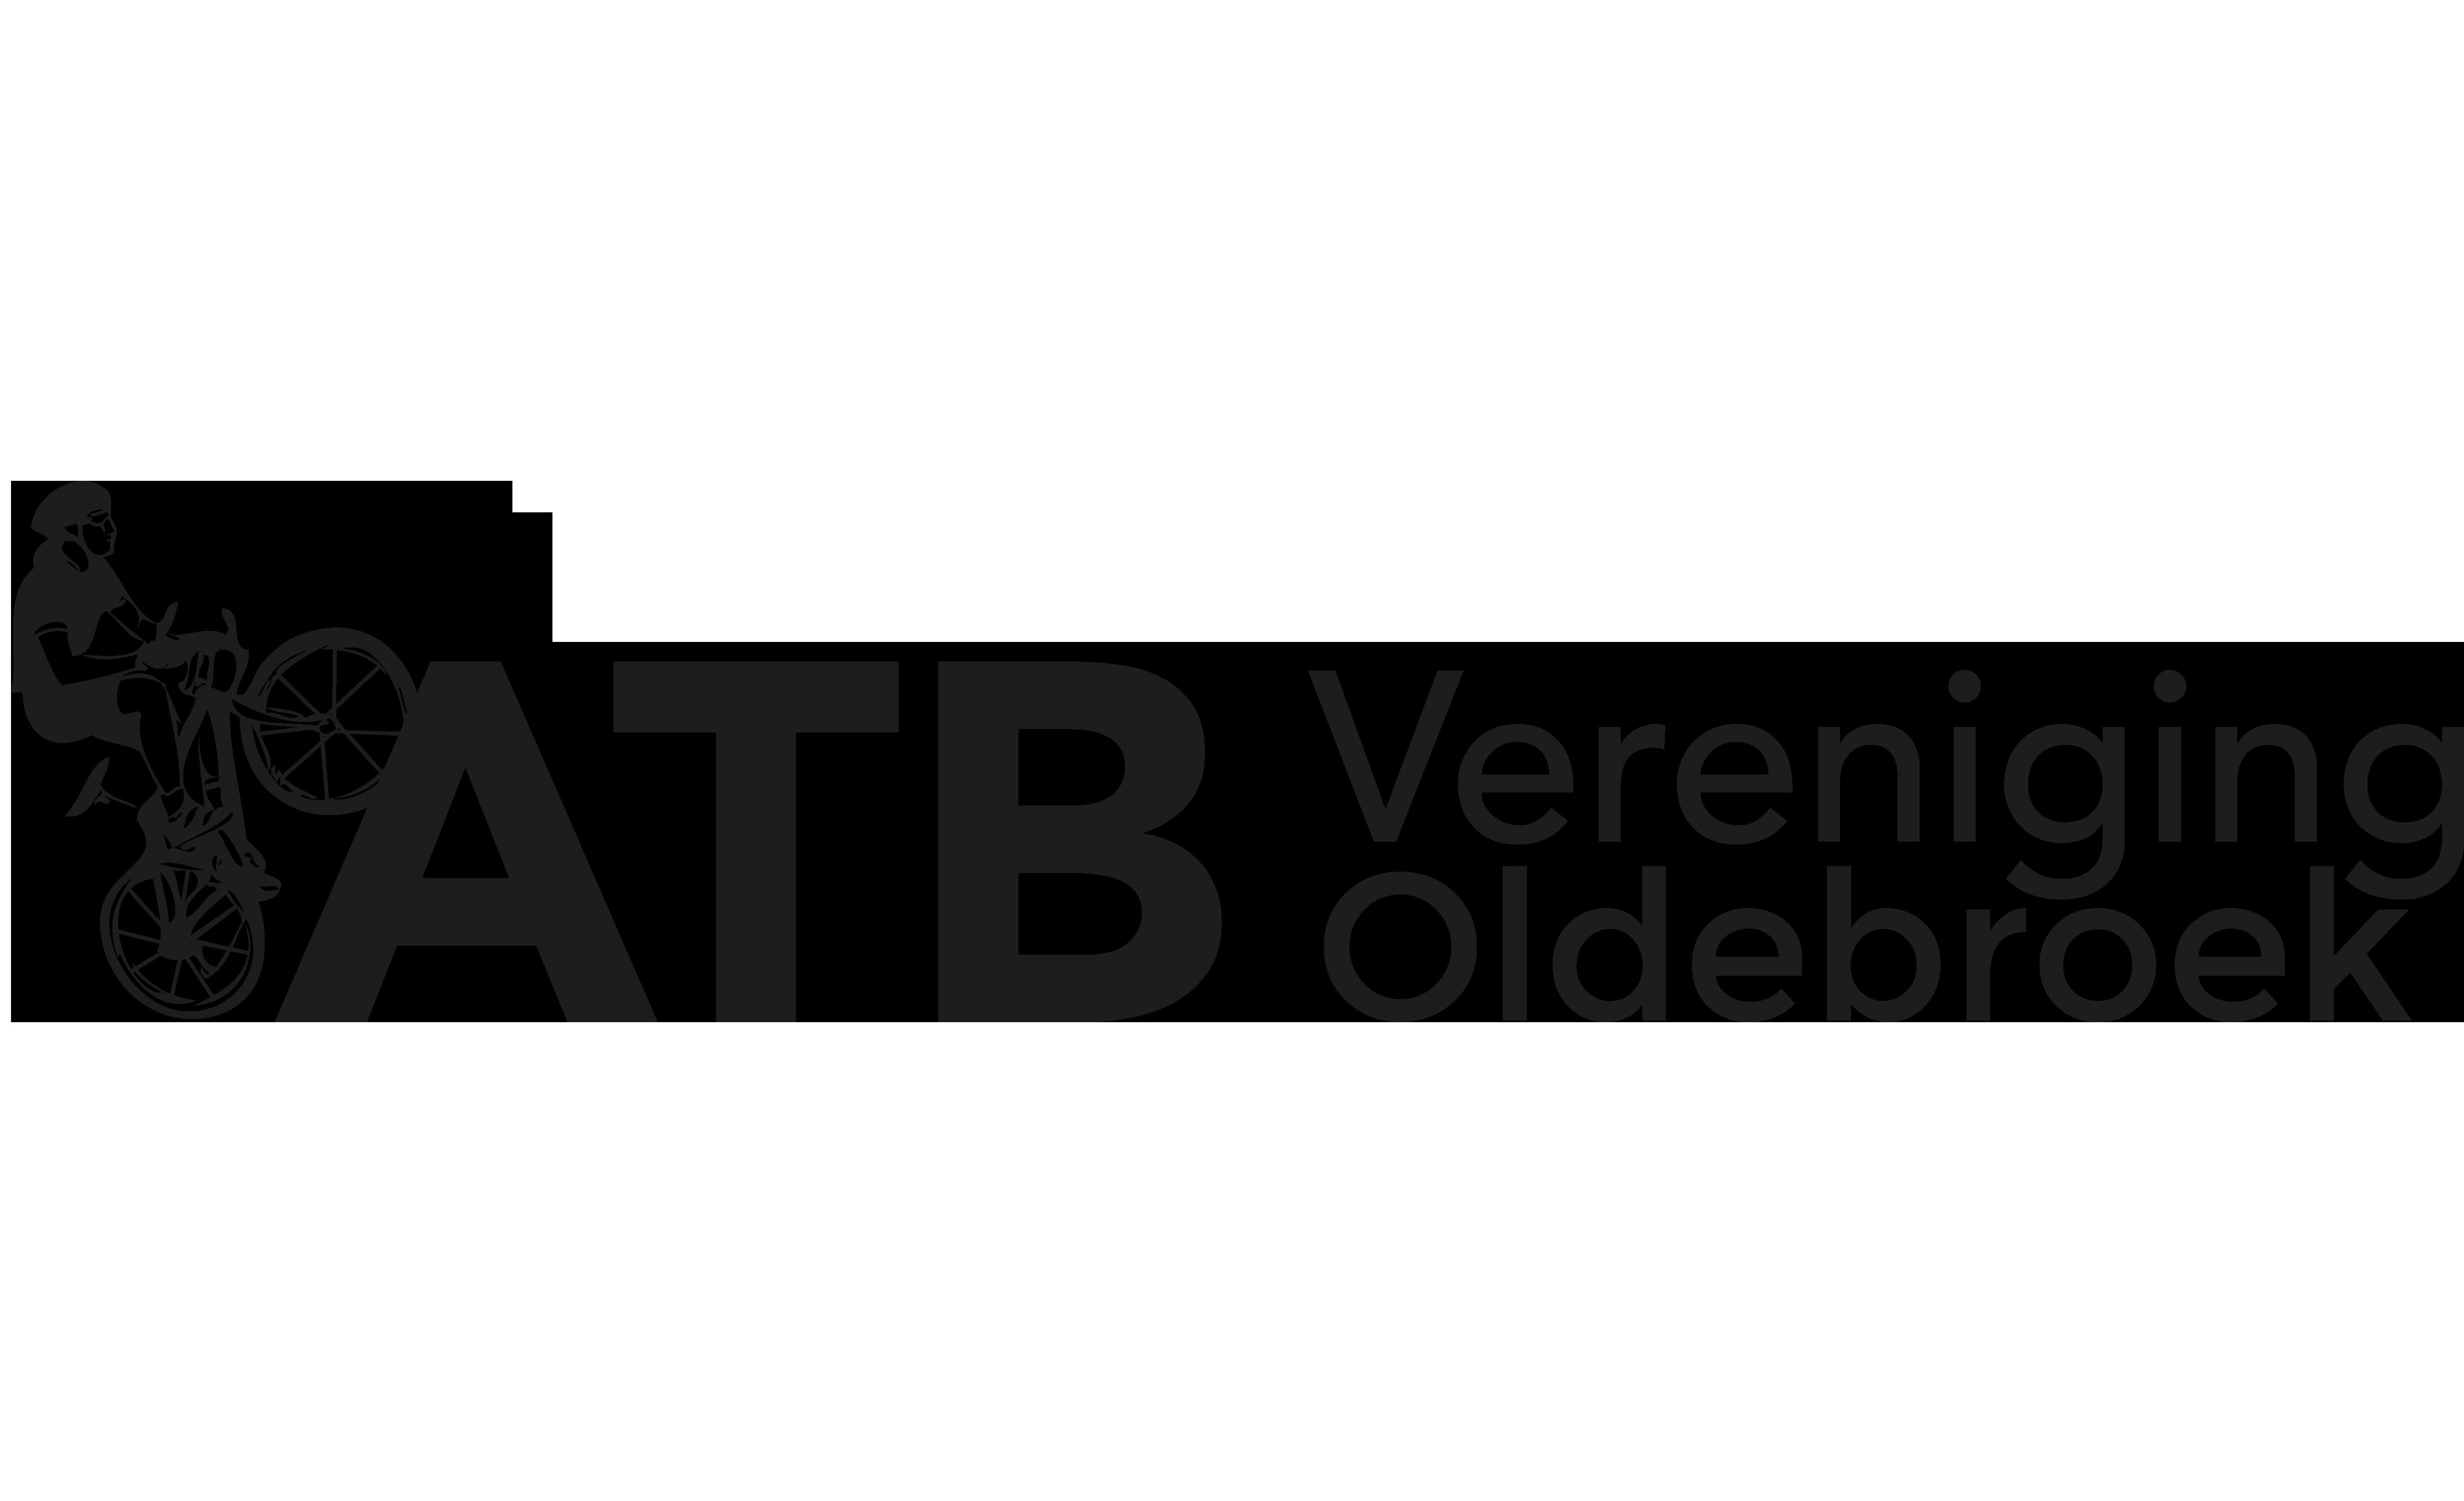 ATB Vereniging Oldebroek